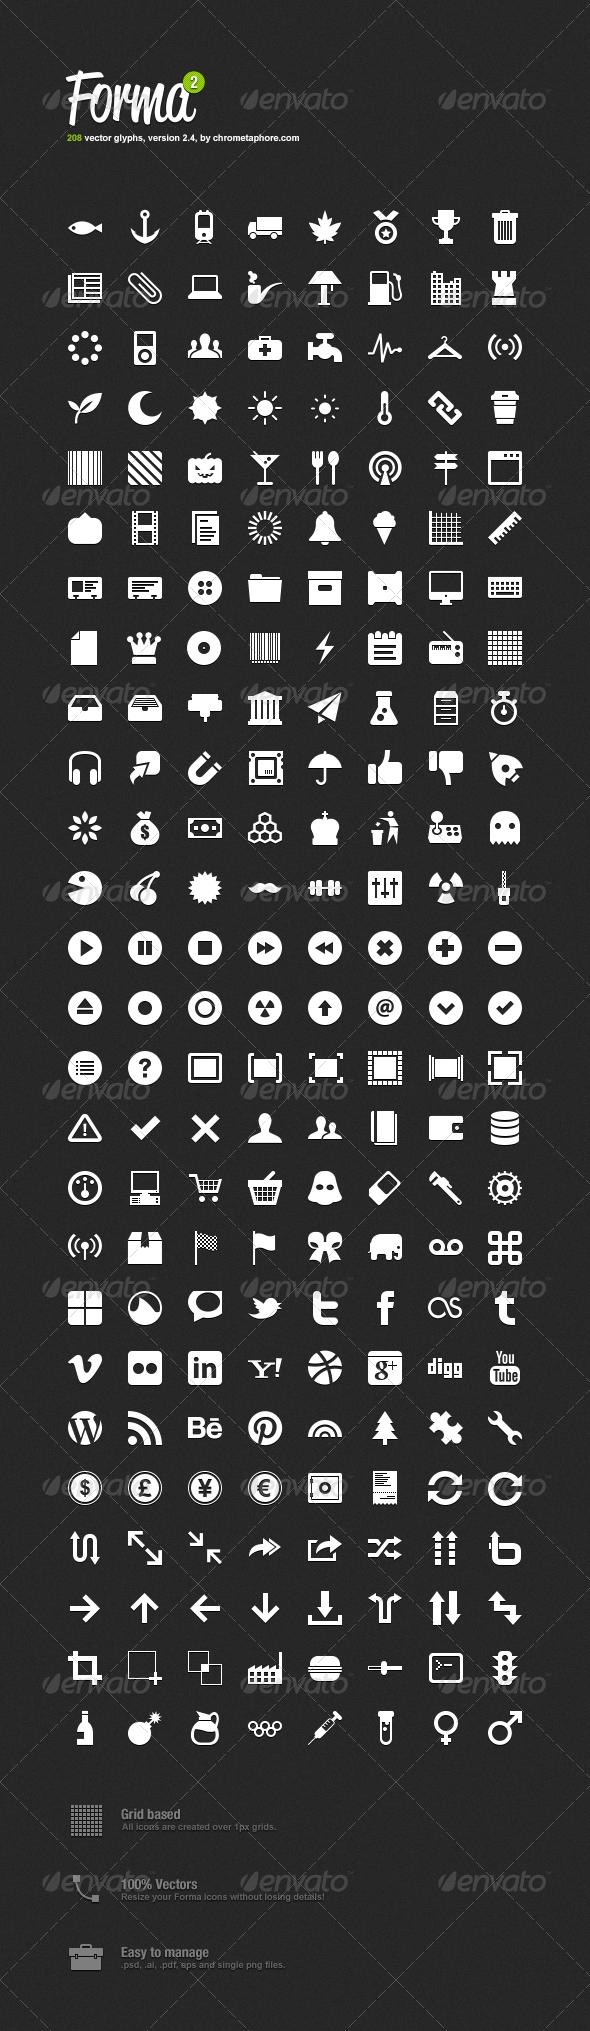 GraphicRiver Forma Icon Pack 2 554858